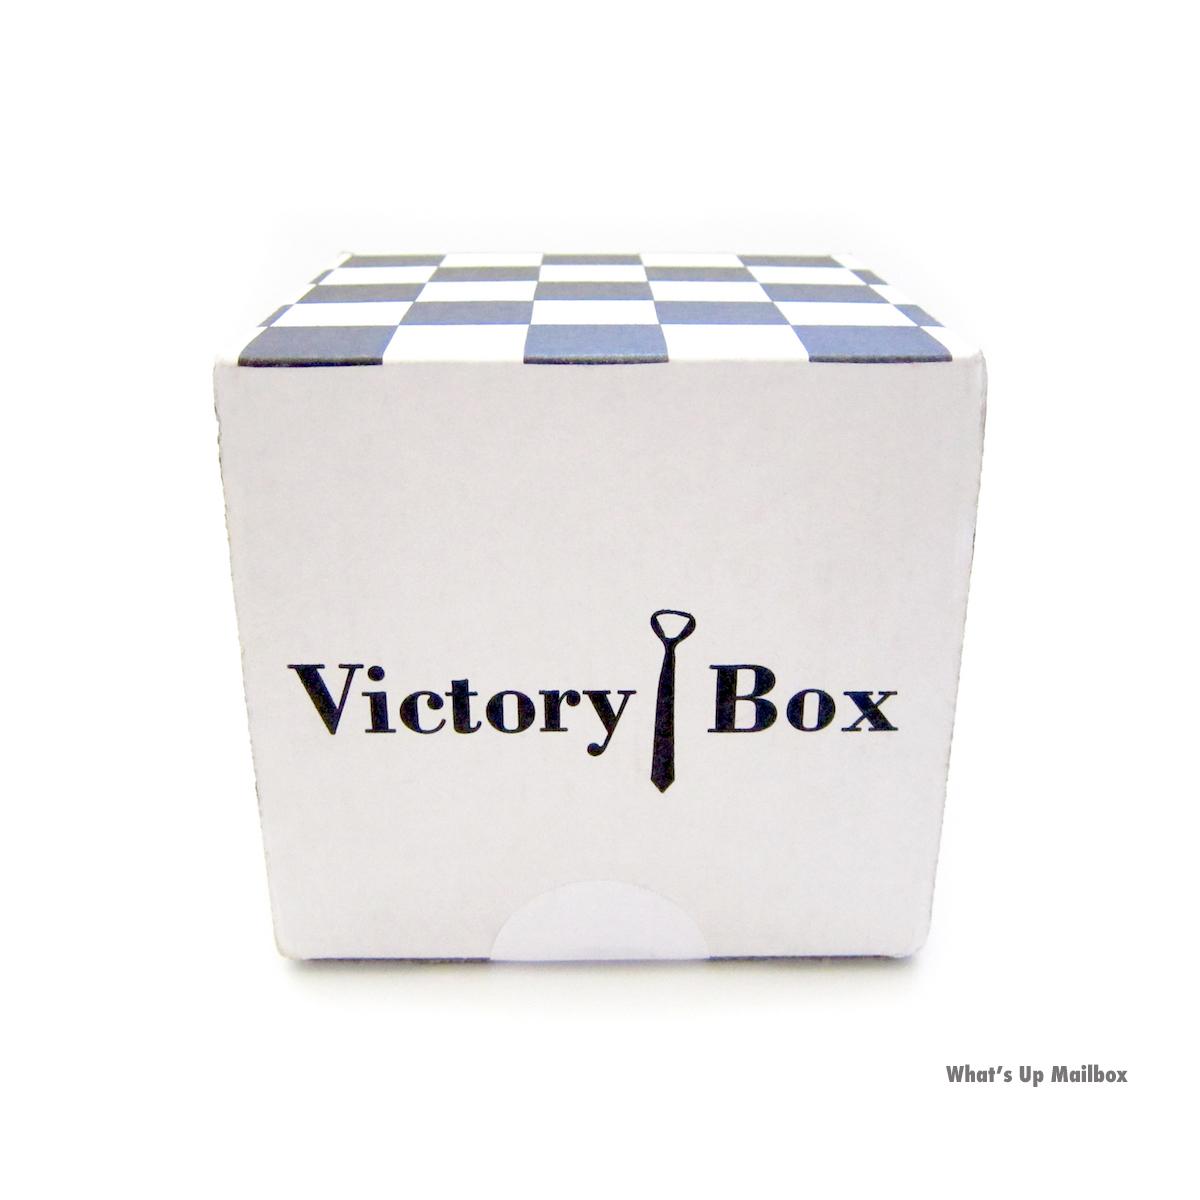 Victory Box June 2016 Box